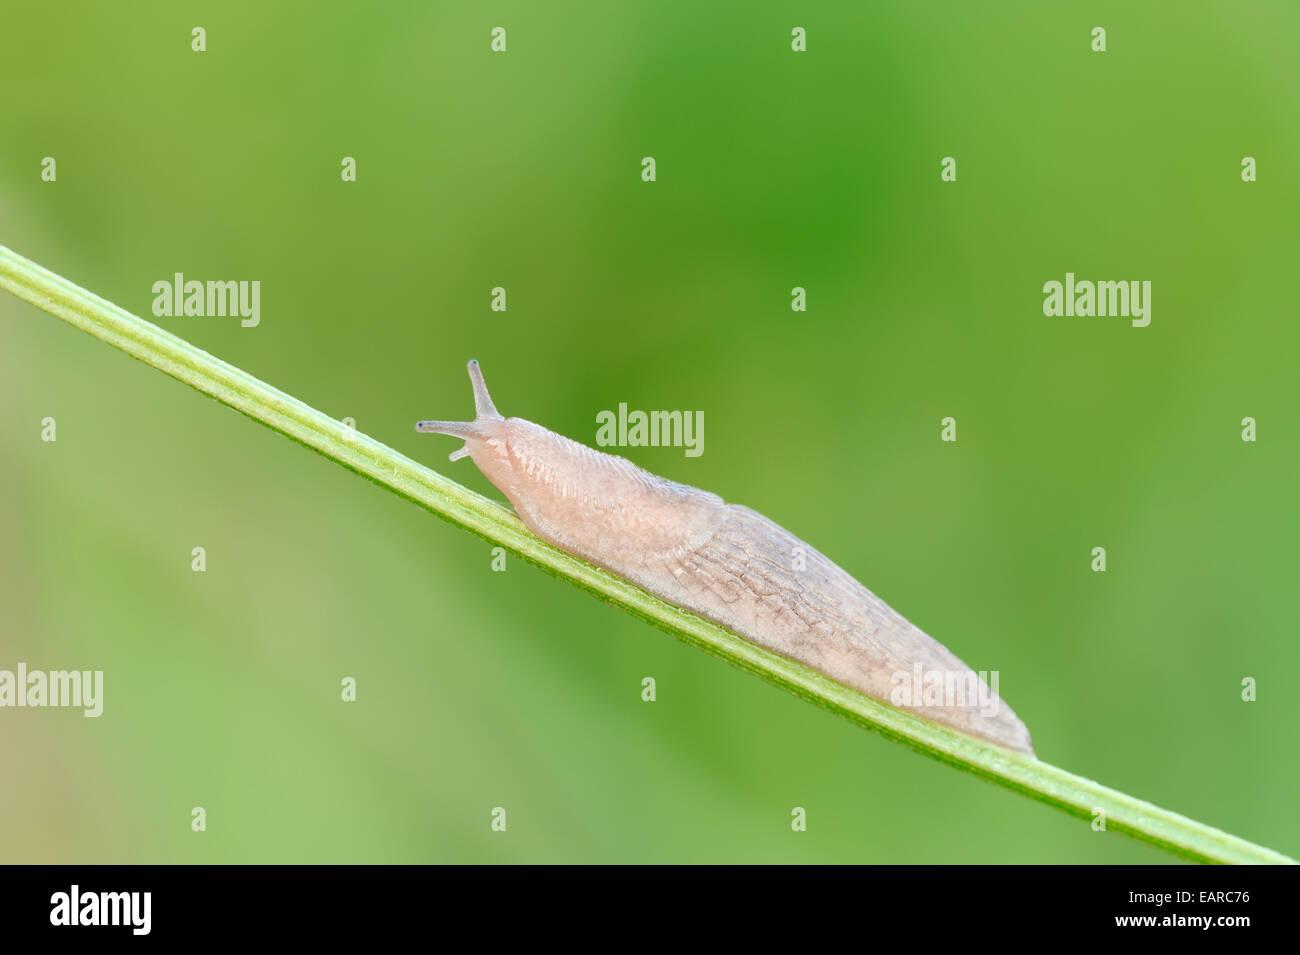 Grey Garden Snail (Deroceras reticulatum) on blade of grass, North Rhine-Westphalia, Germany - Stock Image